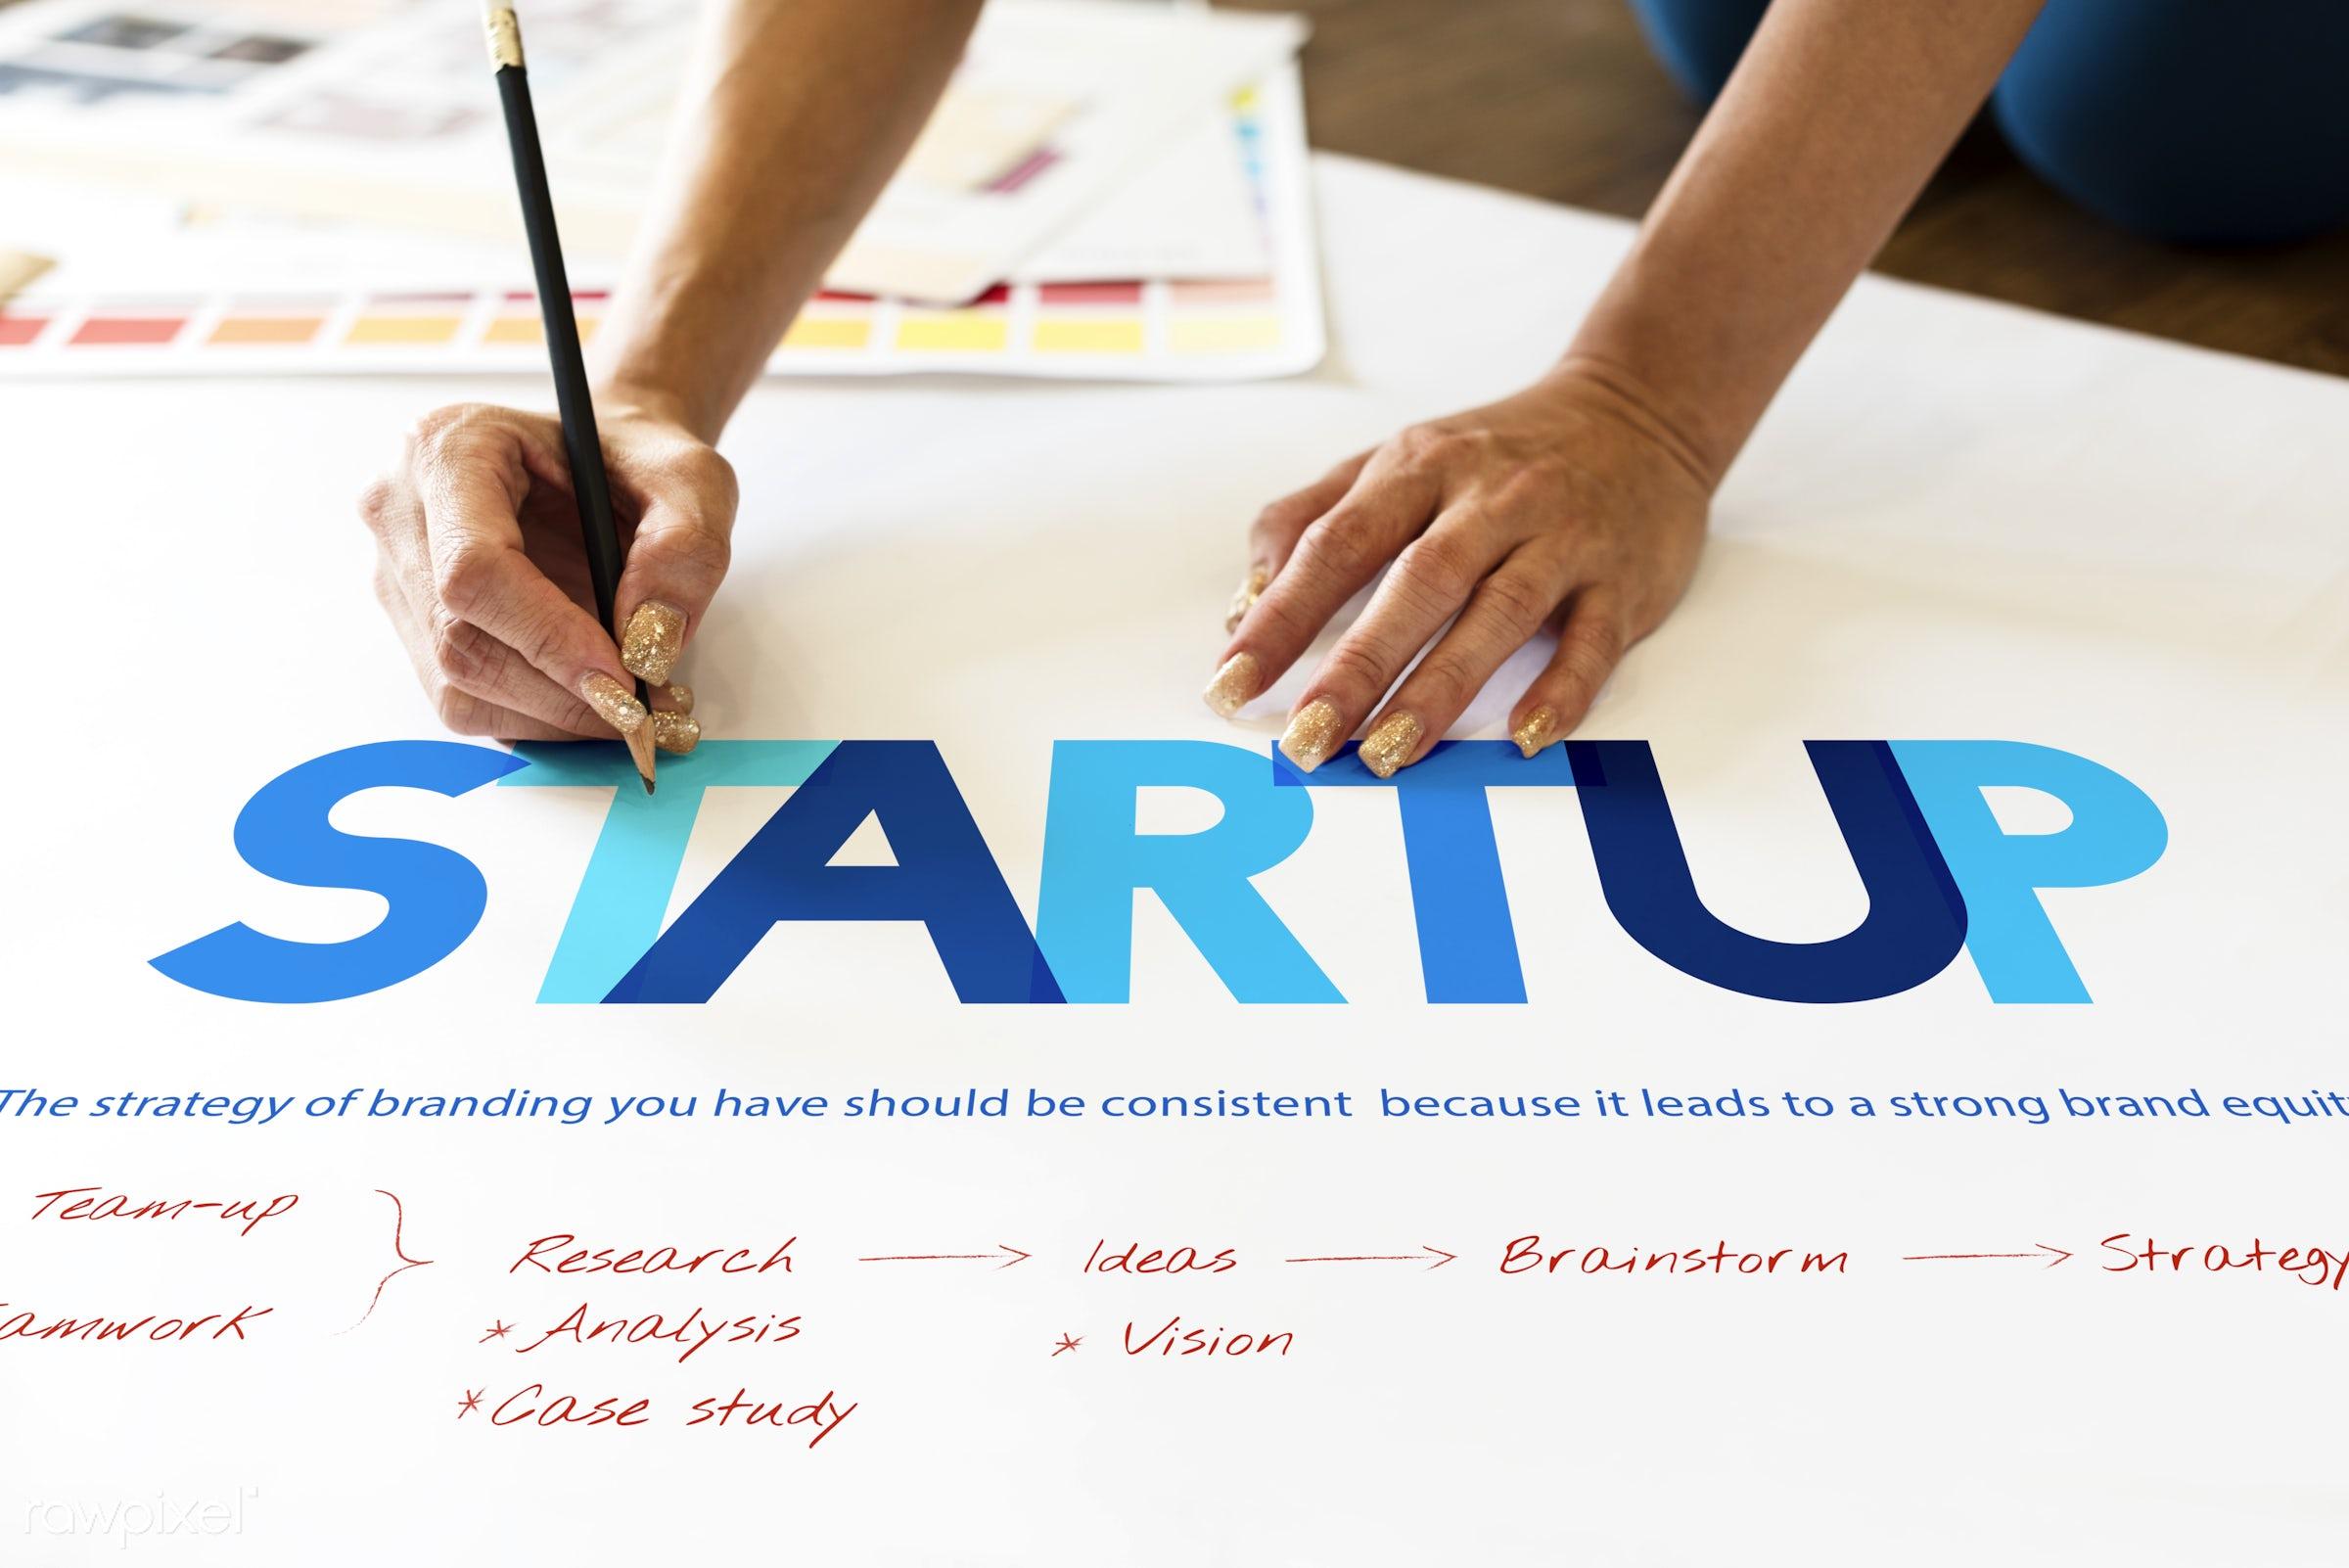 Startup - startup, brainstorm, creation, inspire, strategy, action, aim, analysis, art, beginning, branding, case study,...